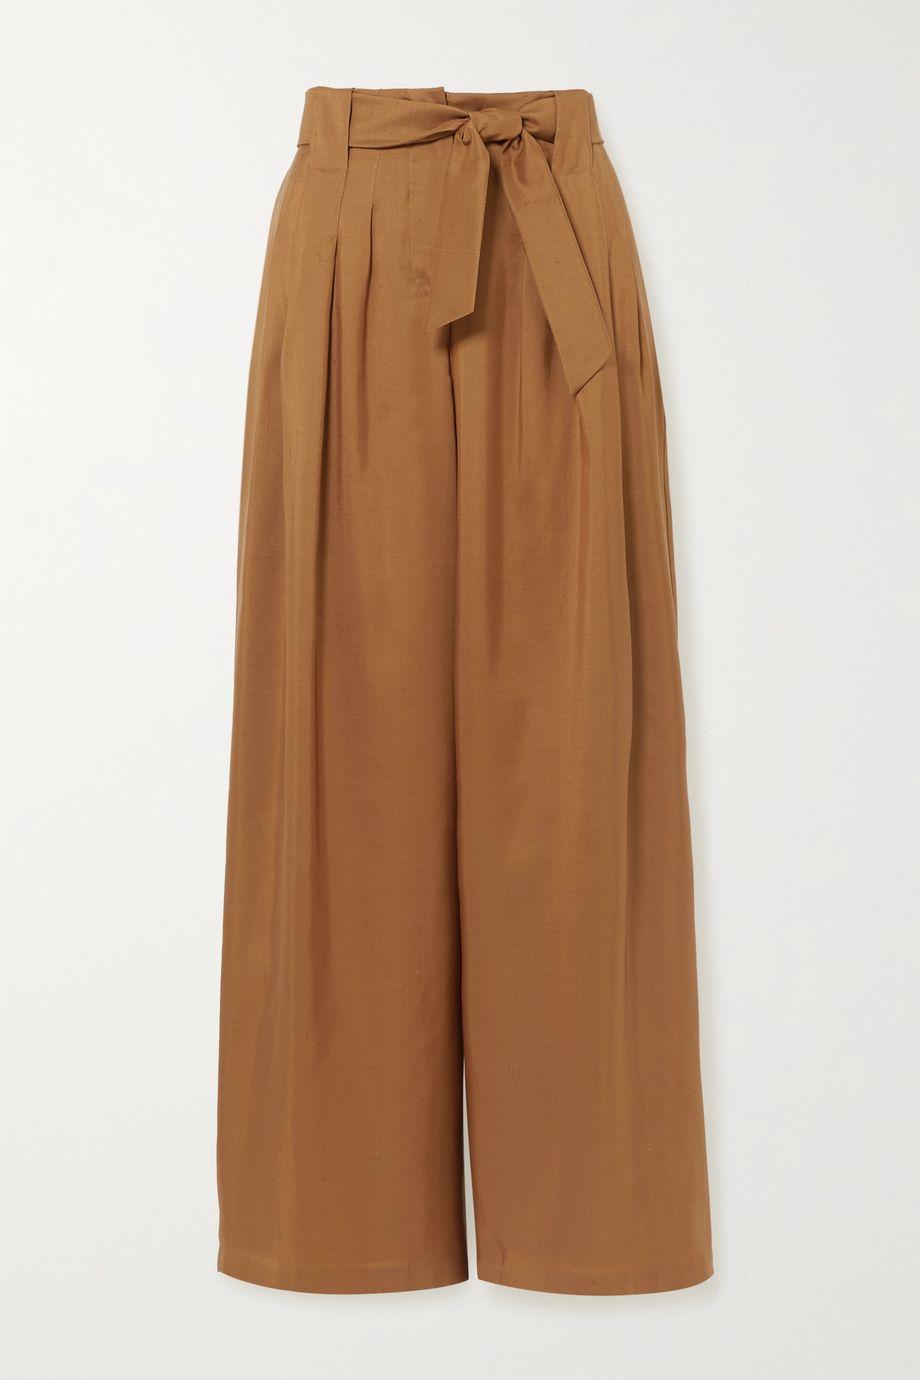 Max Mara Arten pleated silk-shantung wide-leg pants